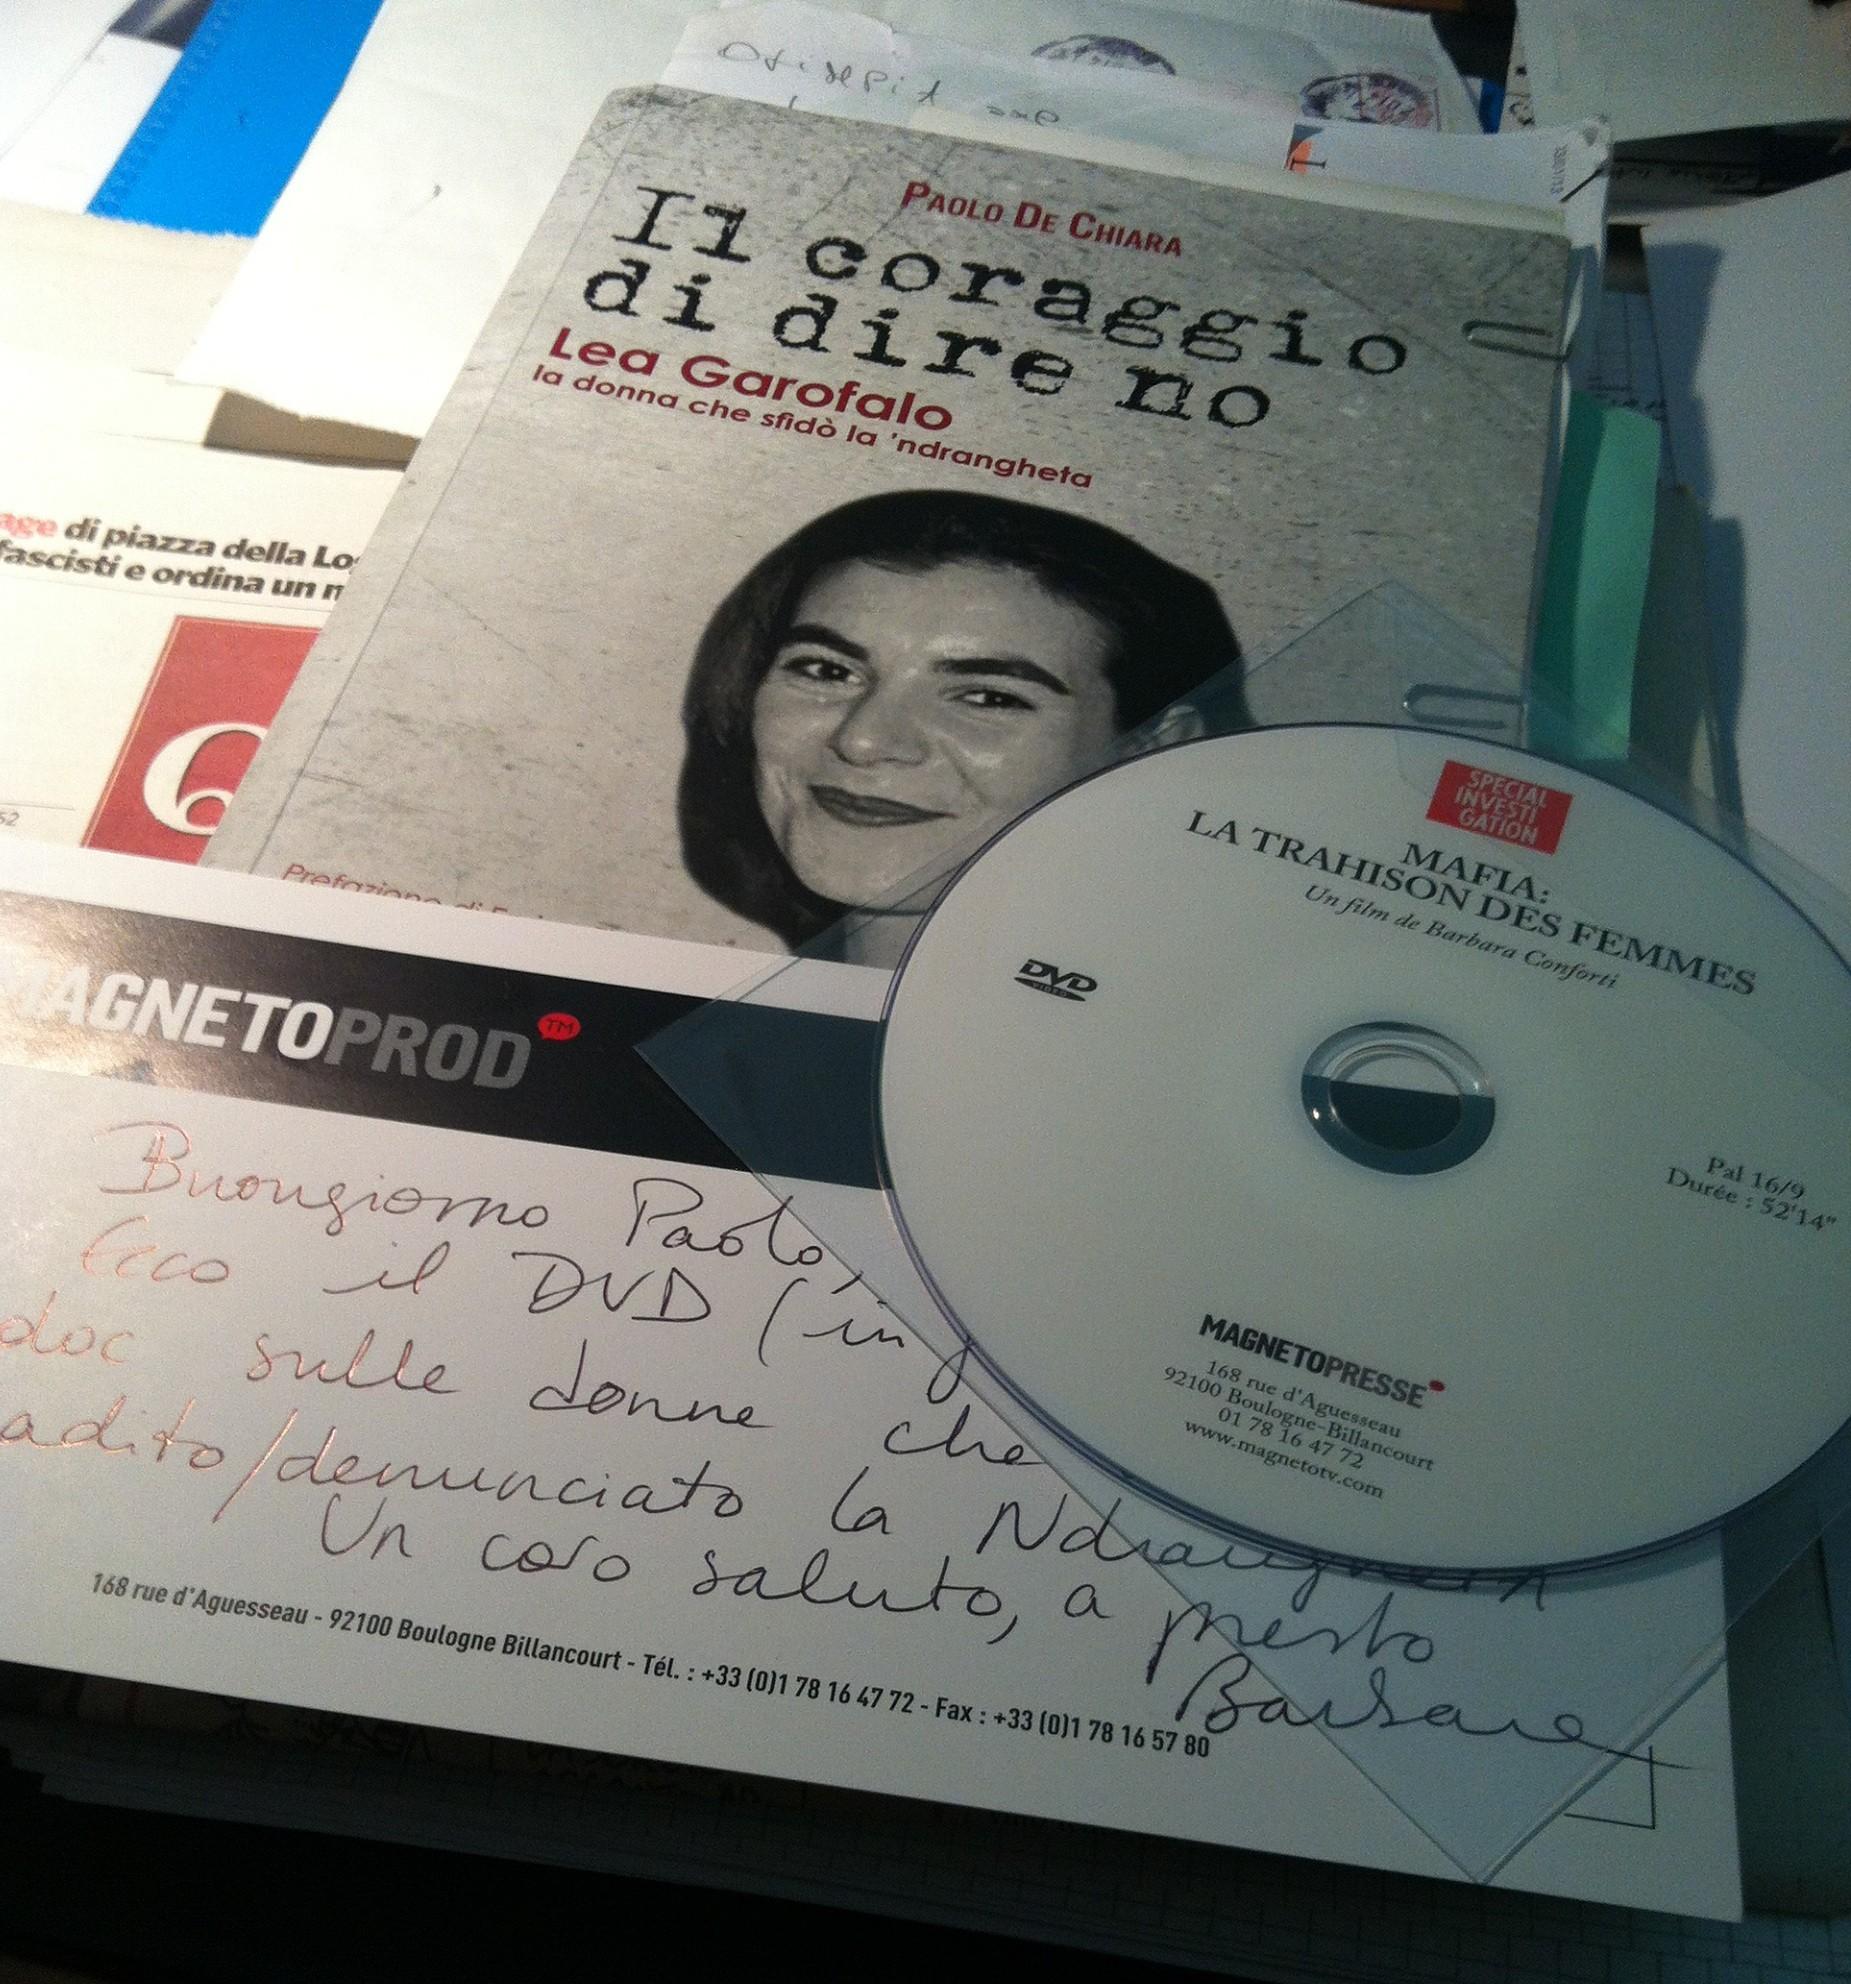 DVD copertina documentario CANAL + di Barbara Conforti